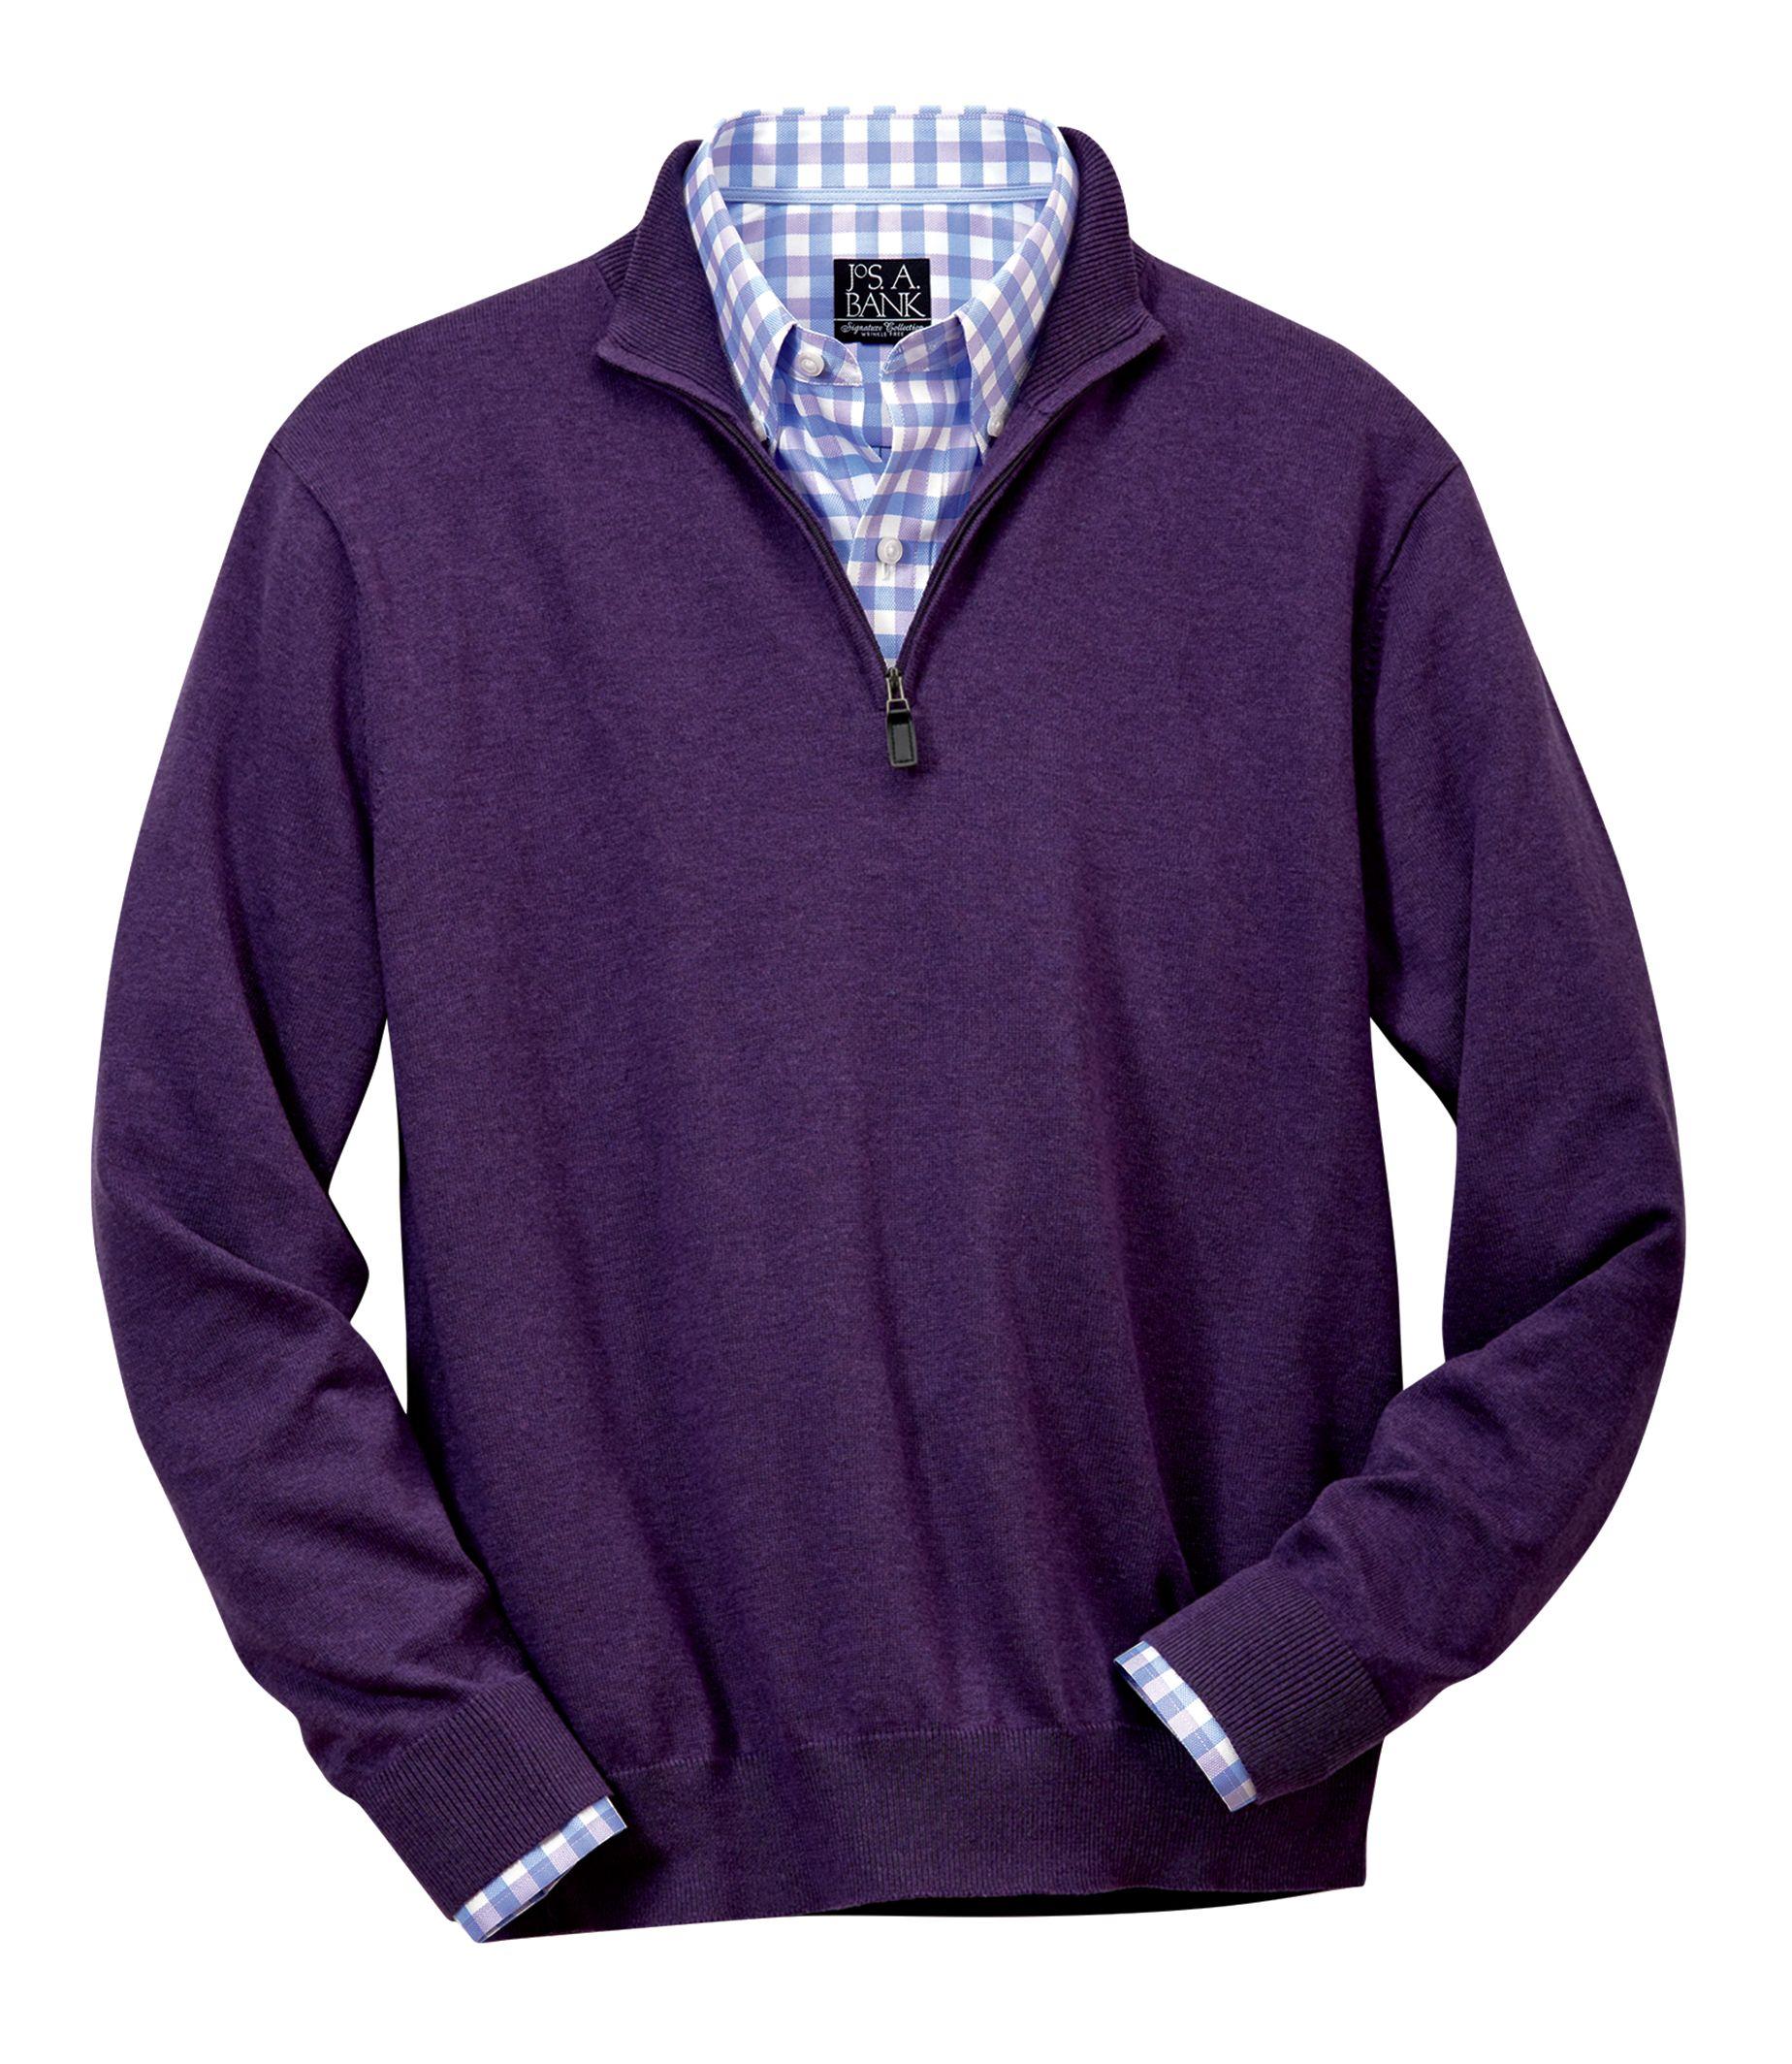 Signature Pima Cotton Half-Zip Sweater Big/Tall CLEARANCE | Zip ...